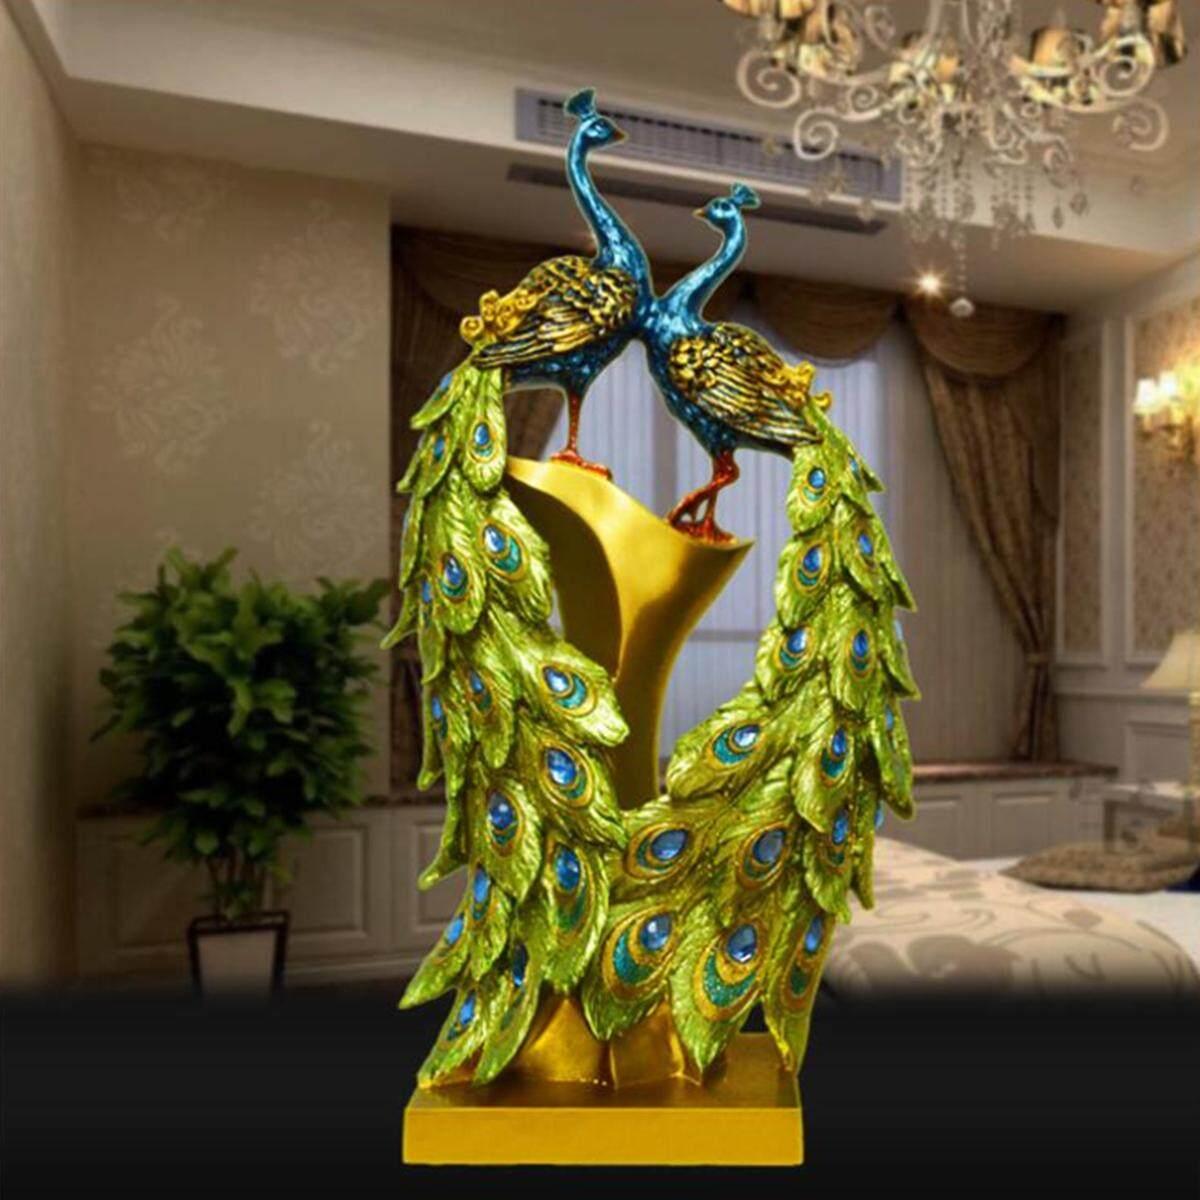 Couple Peacock Resin Decor Home Ornament Decorations Figurine Statue Sculpture